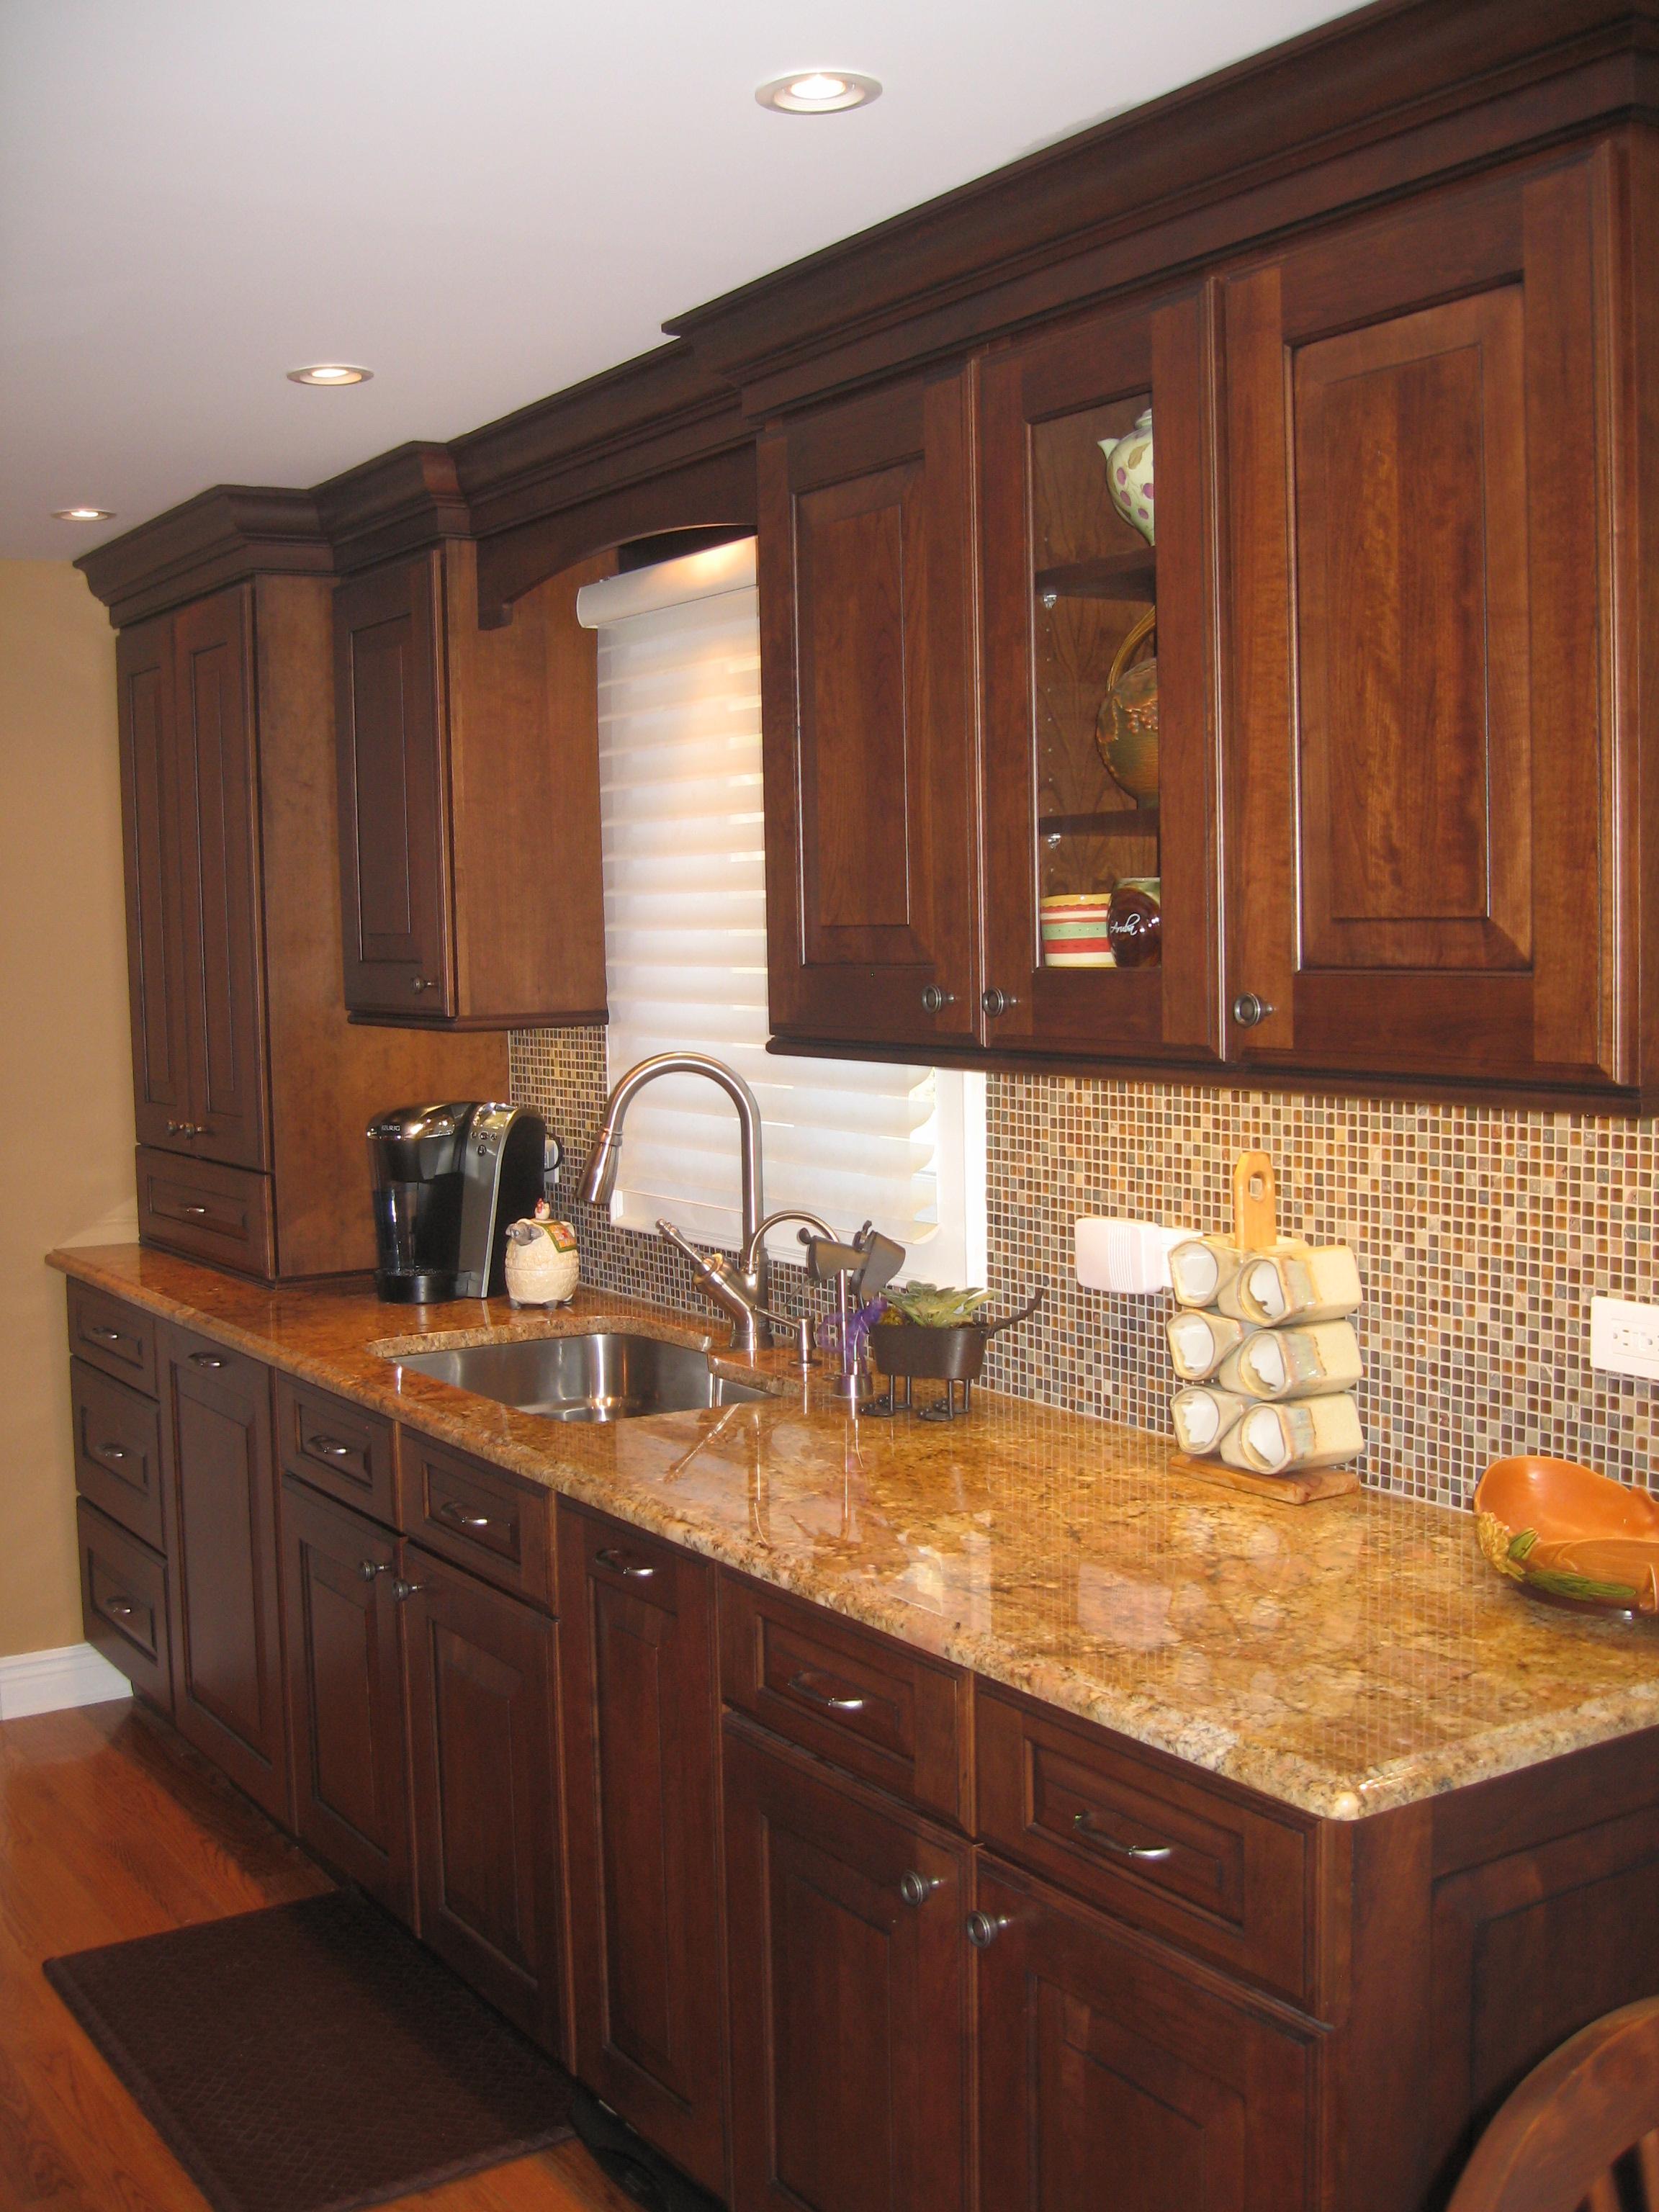 Cabinetry Toni Sabatino Style